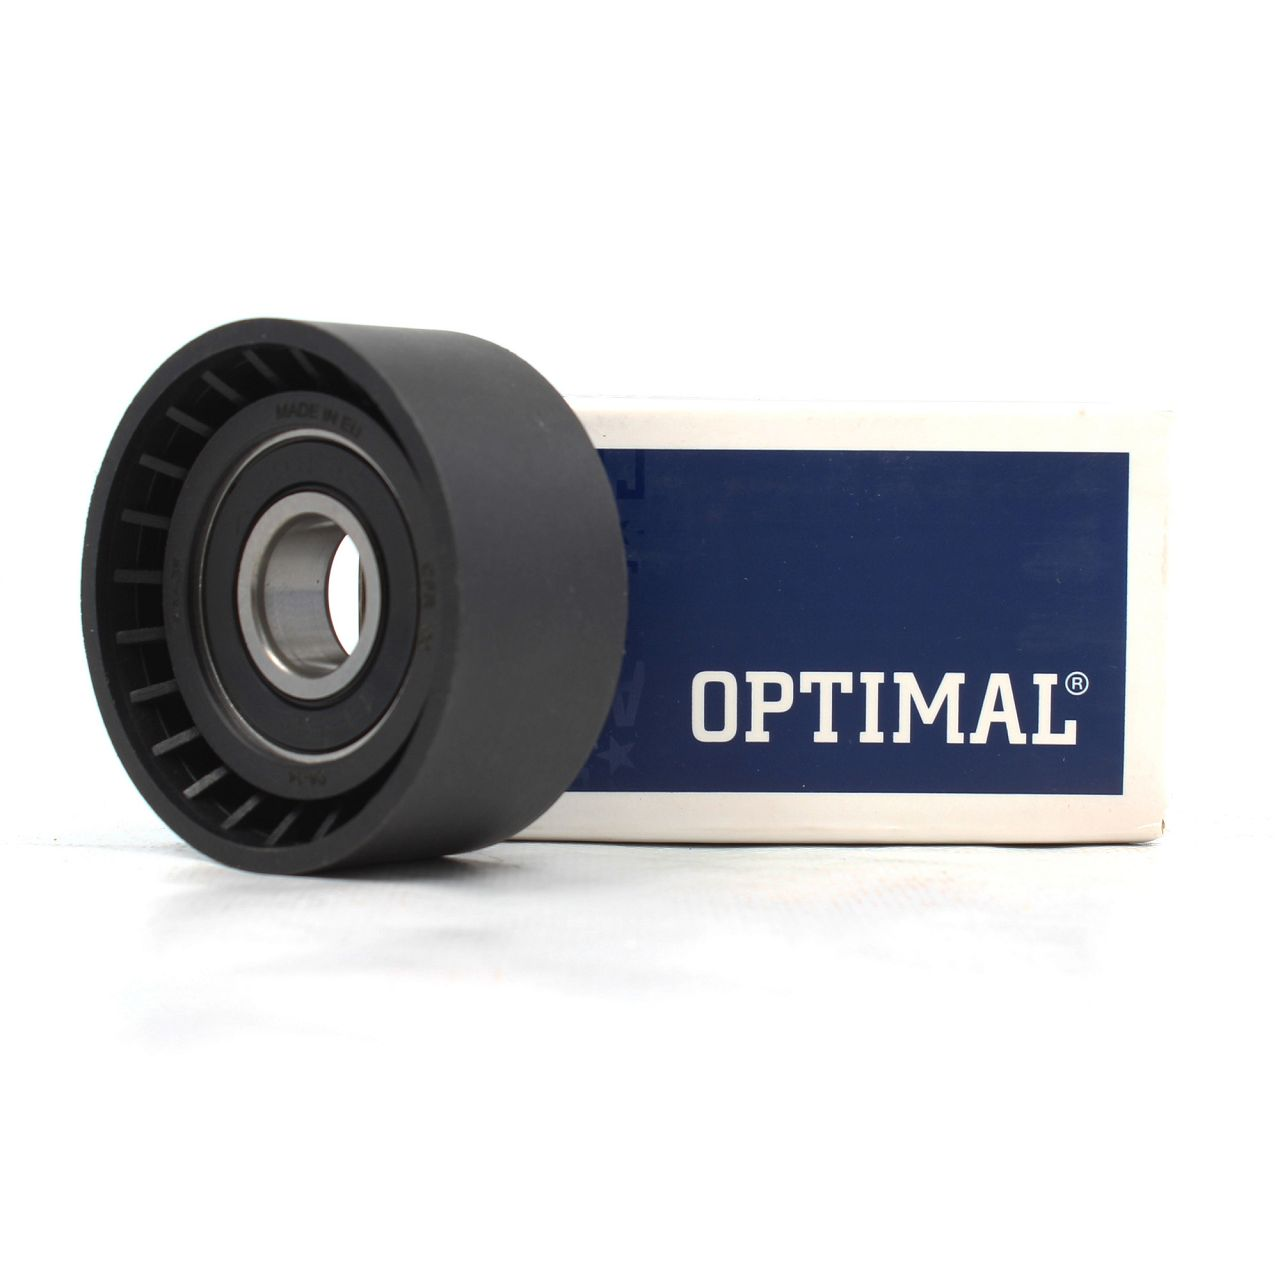 OPTIMAL Umlenkrolle Führungsrolle Keilrippenriemen für Nissan Opel Renault Volvo